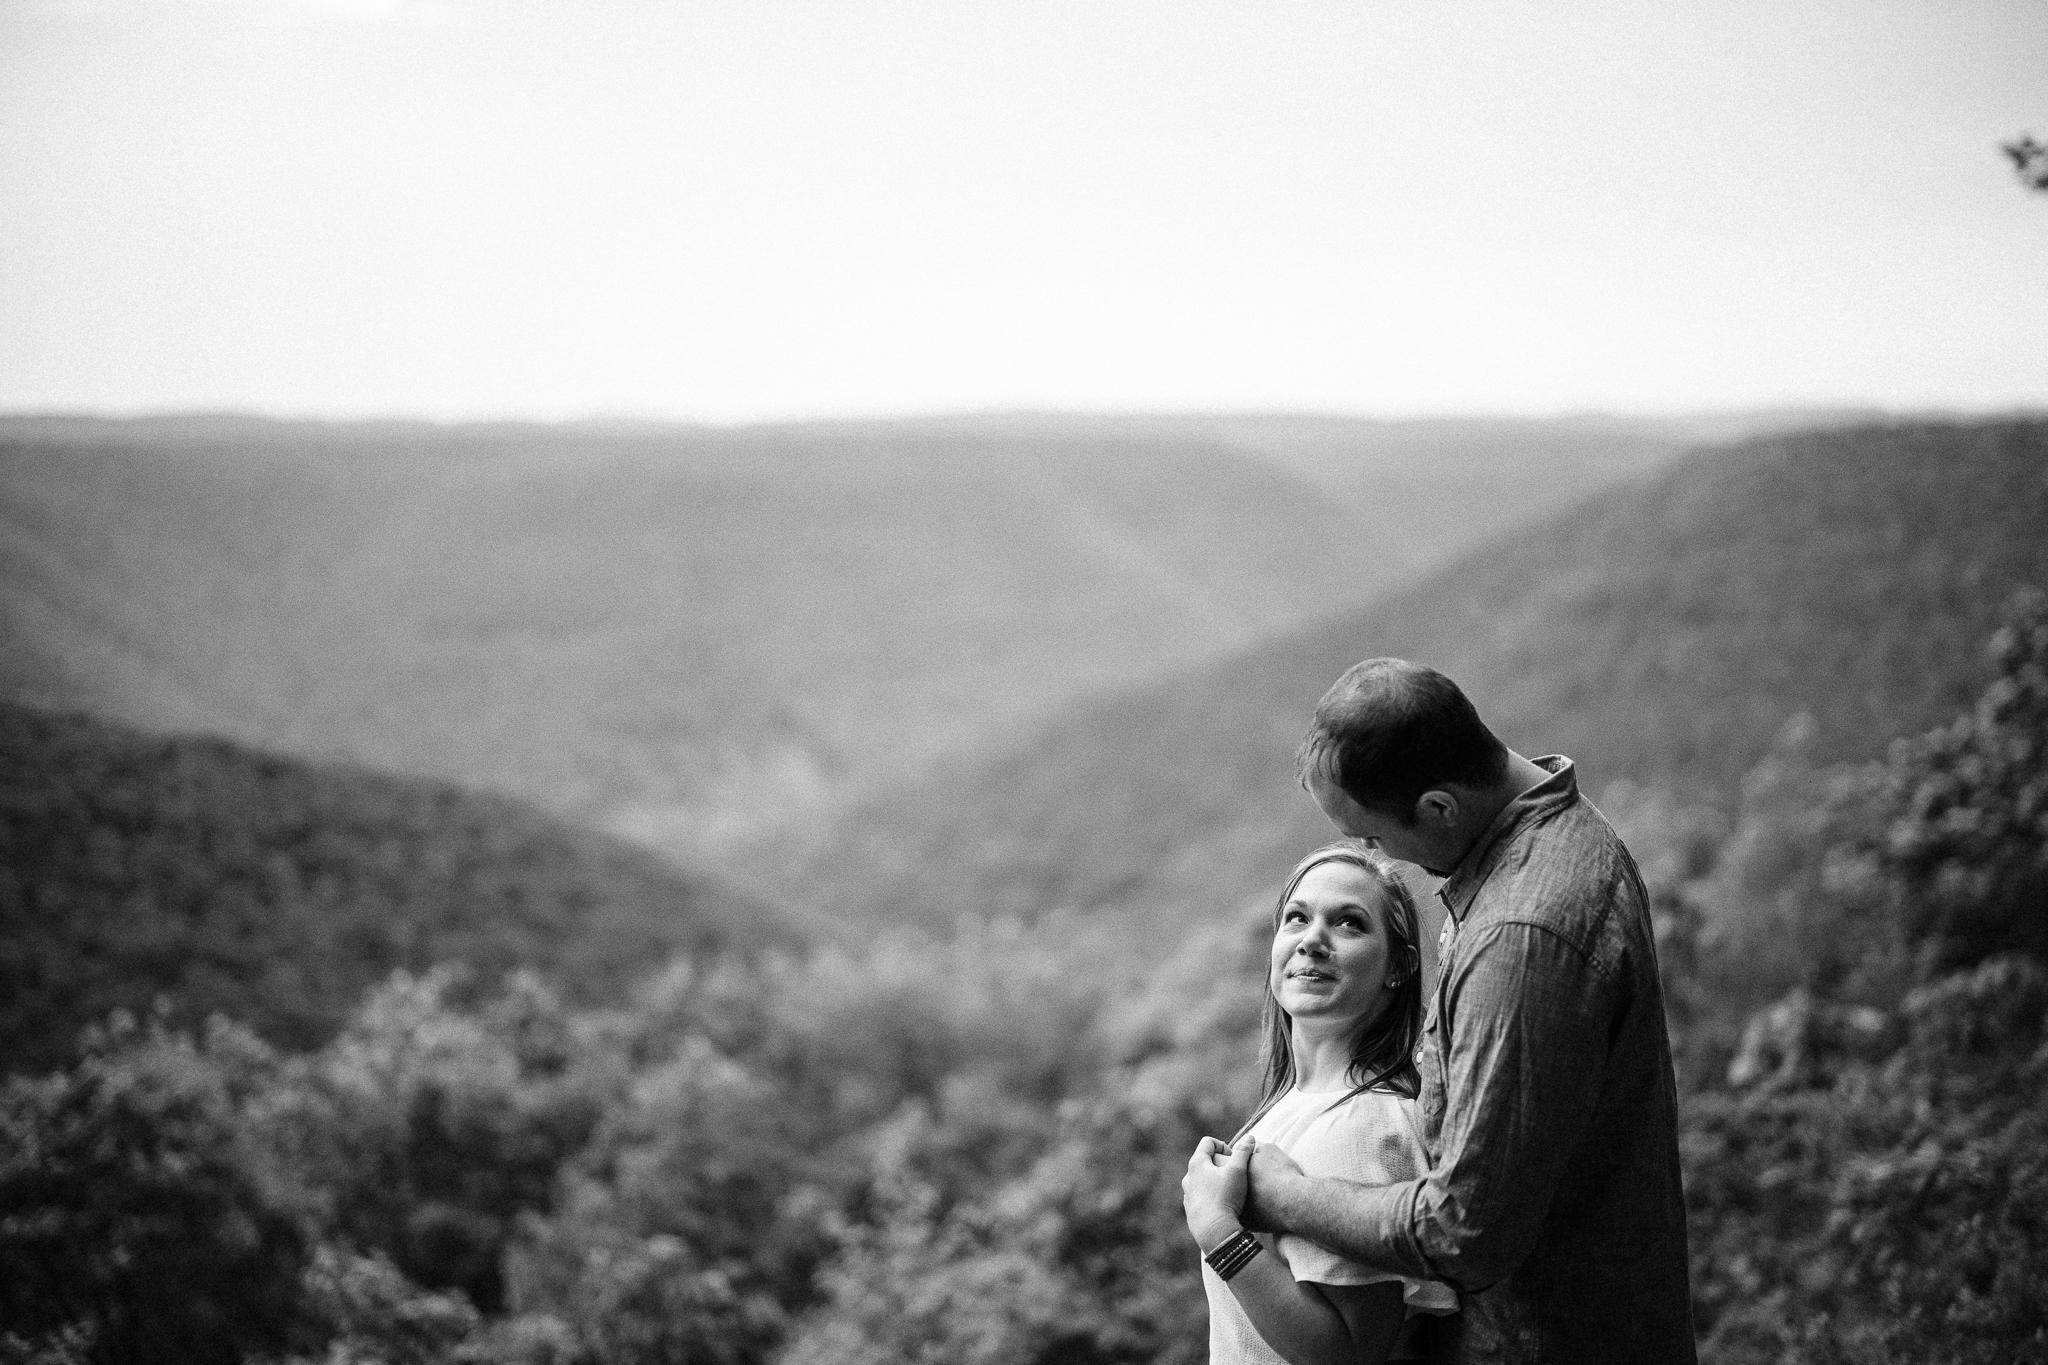 Kettle-creek-state-park-engagement-9338.jpg